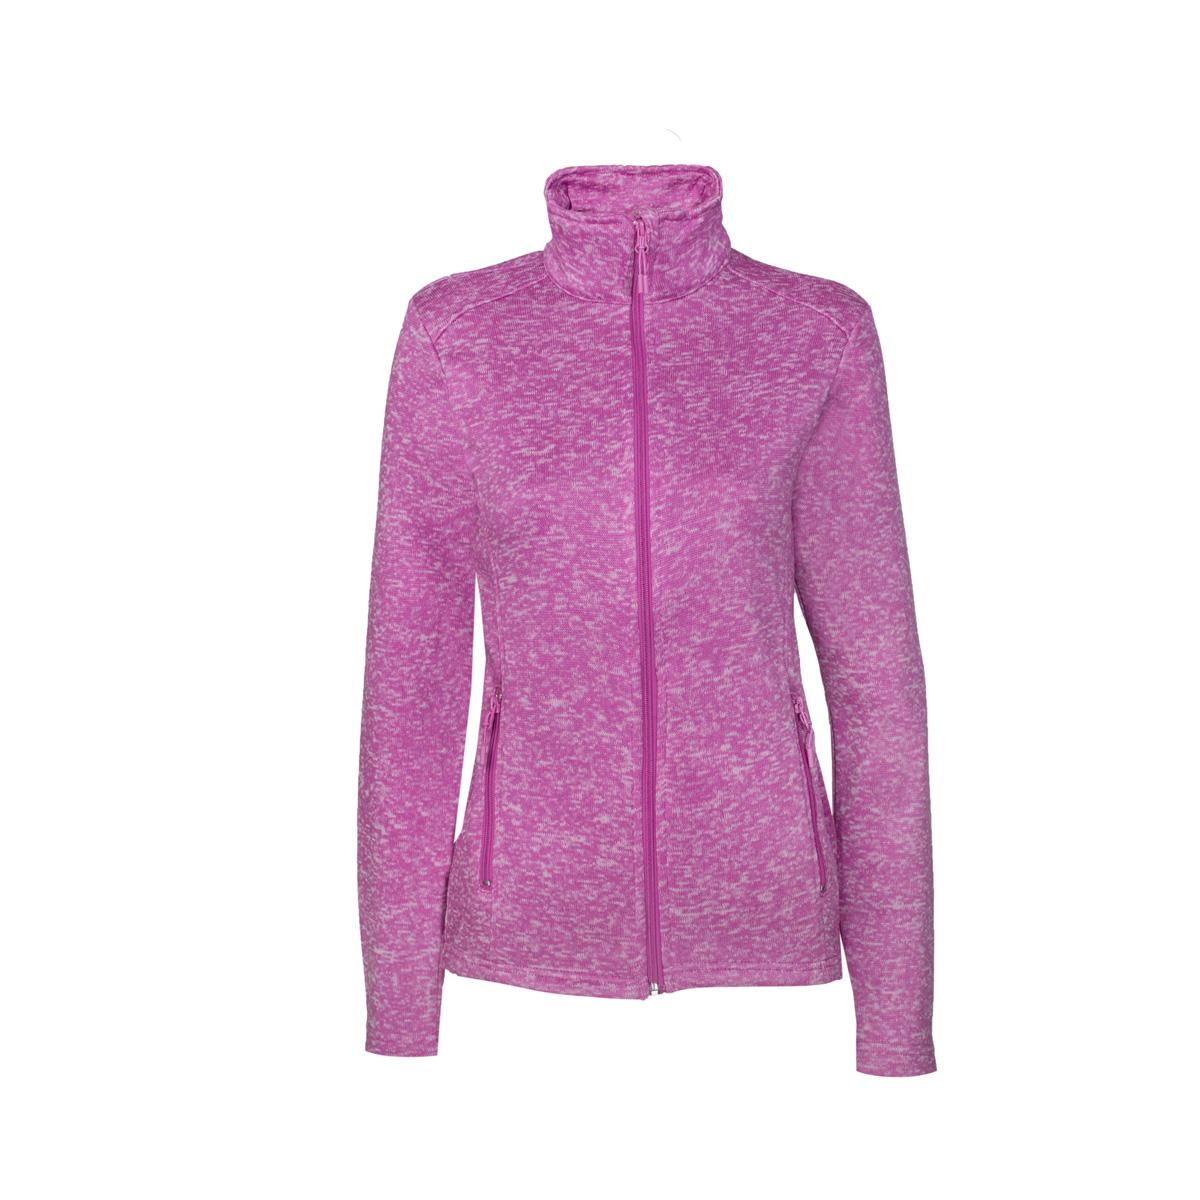 Ženska jakna, temno roza